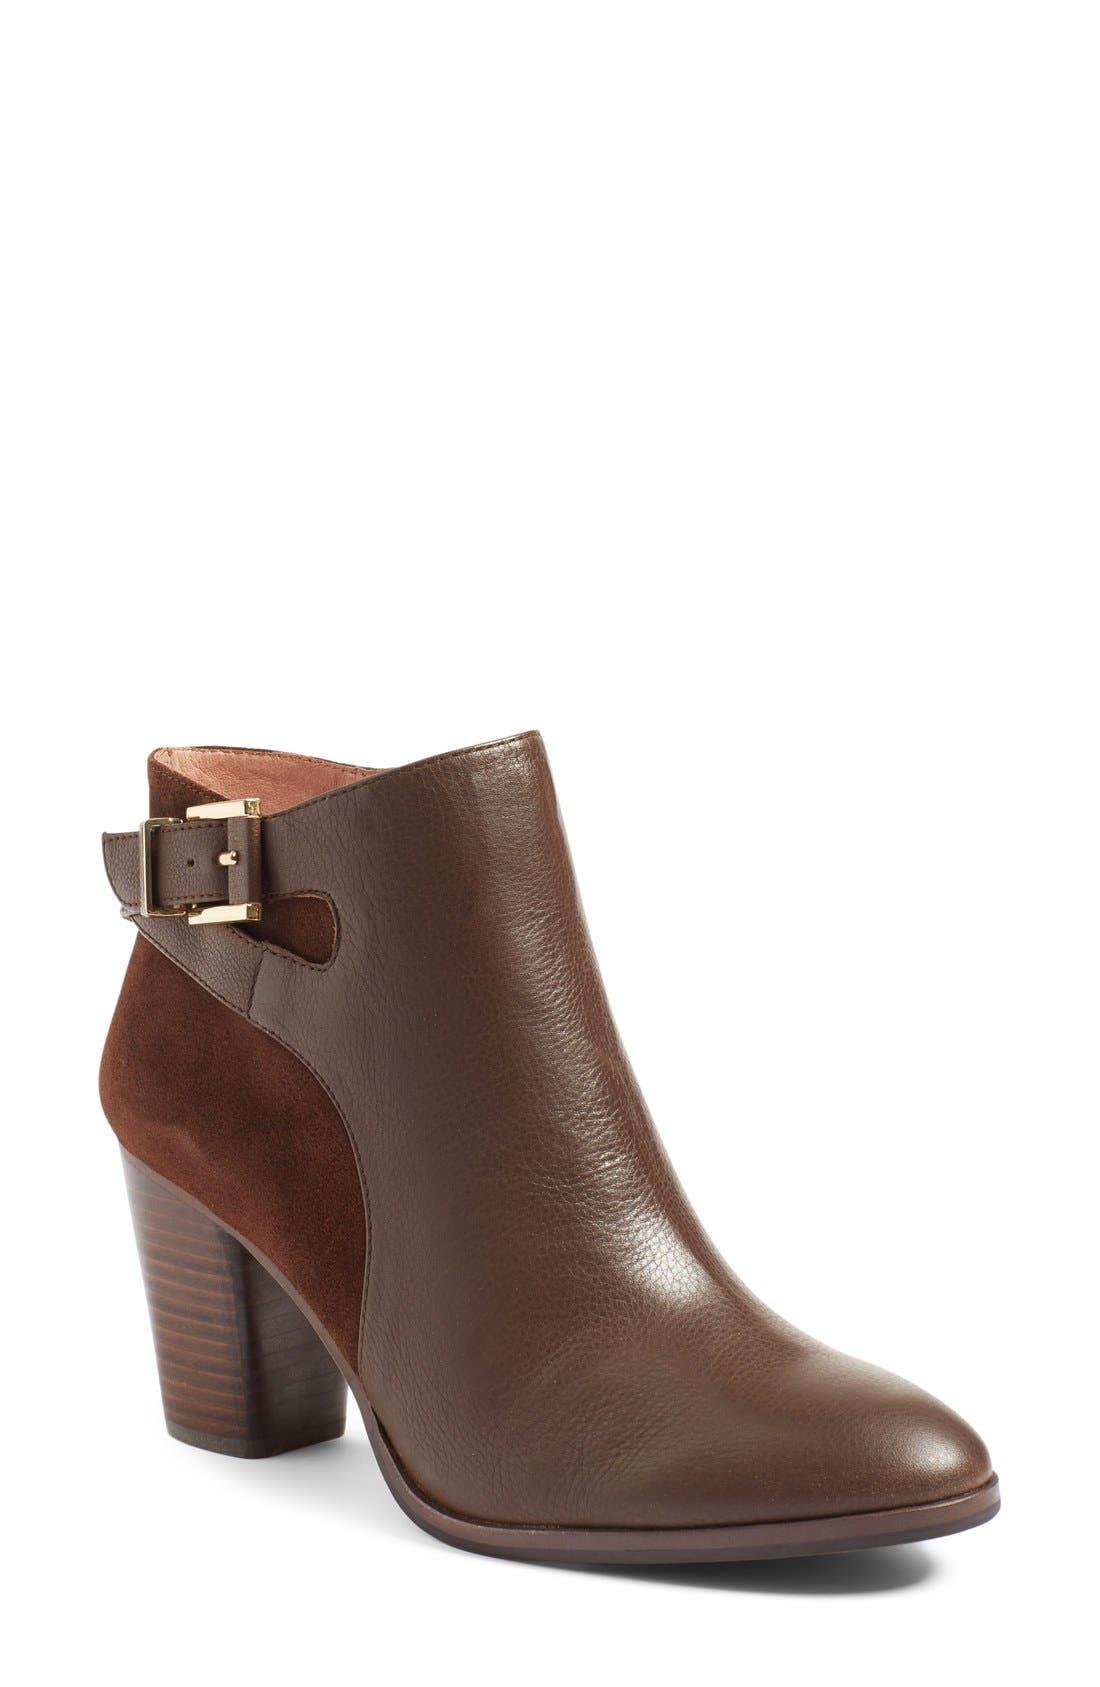 Alternate Image 1 Selected - Louise et Cie 'Vasca' Almond Toe Bootie (Women) (Nordstrom Exclusive)